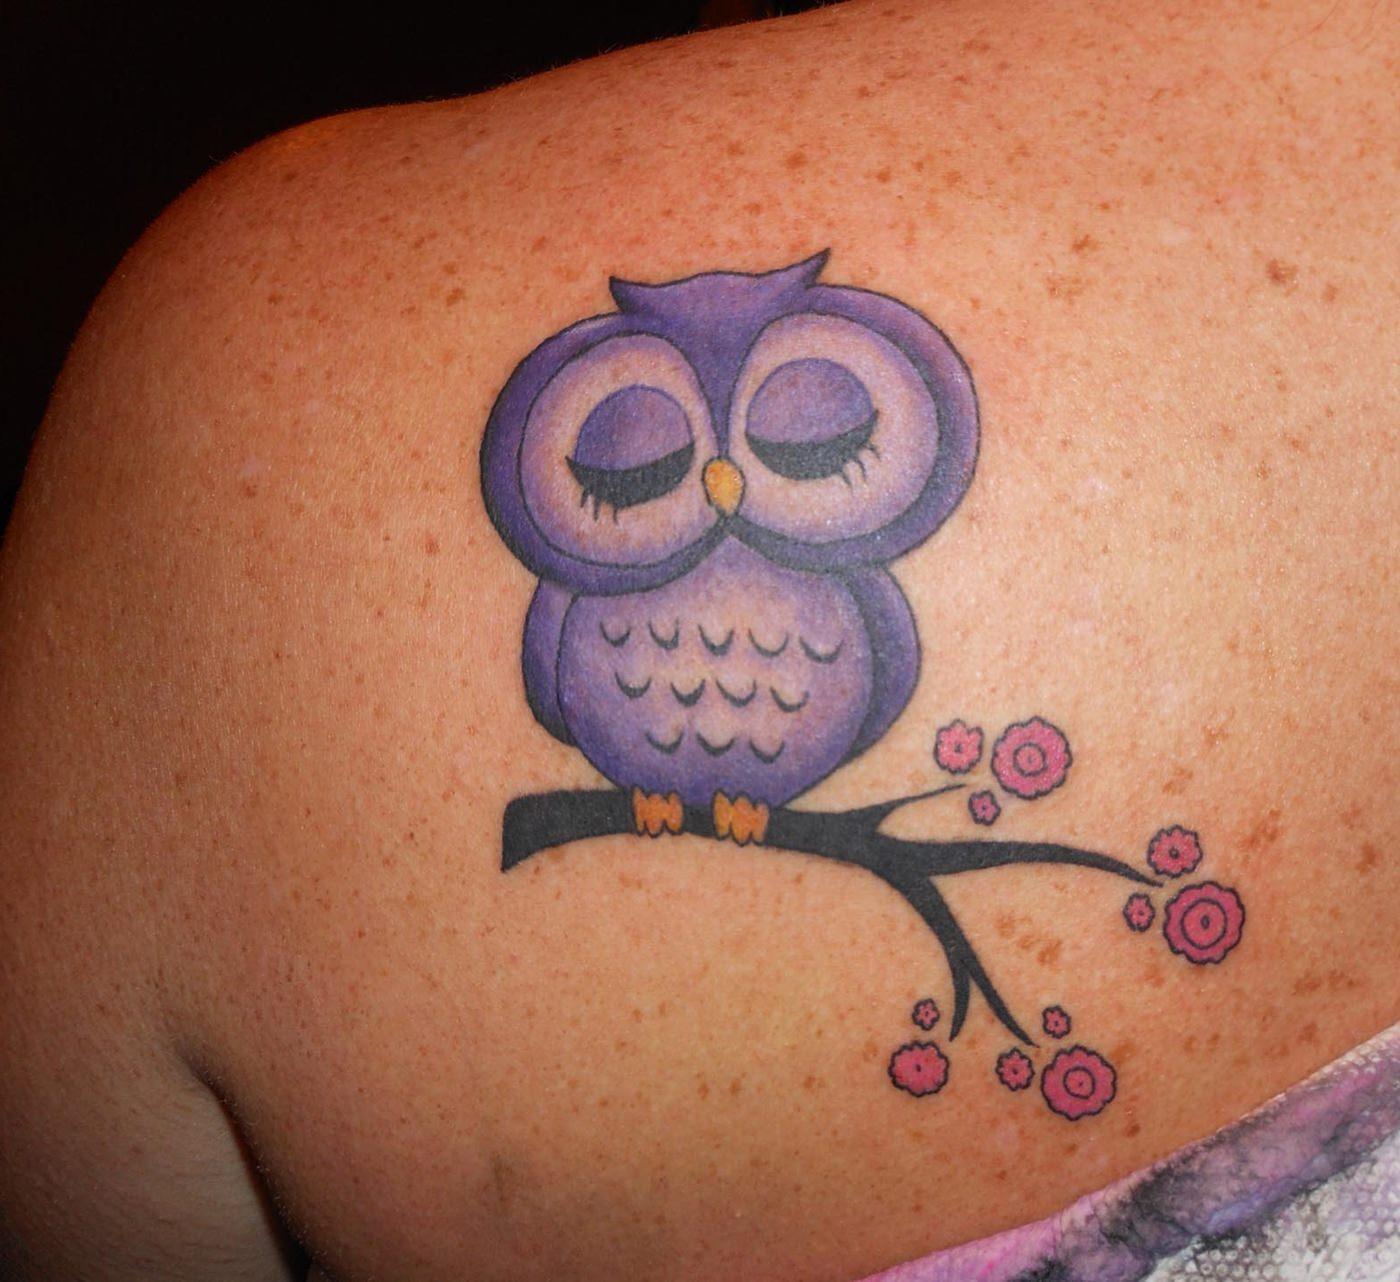 Coruja lilas tatuada nas costas (super cute)